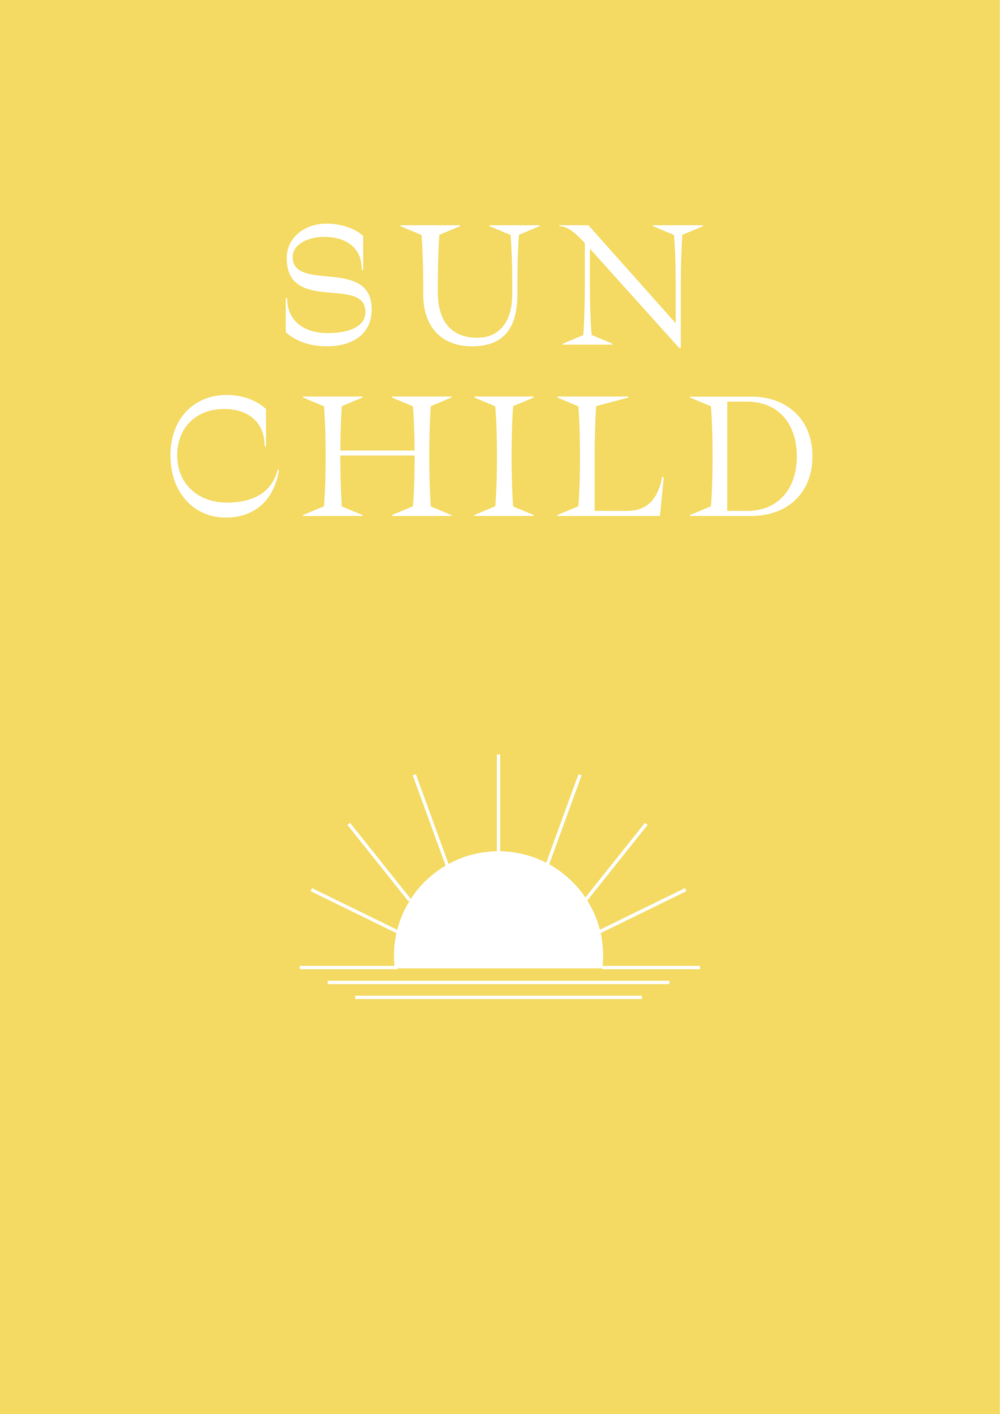 Sun Child // Phylleli Design Studio and Blog